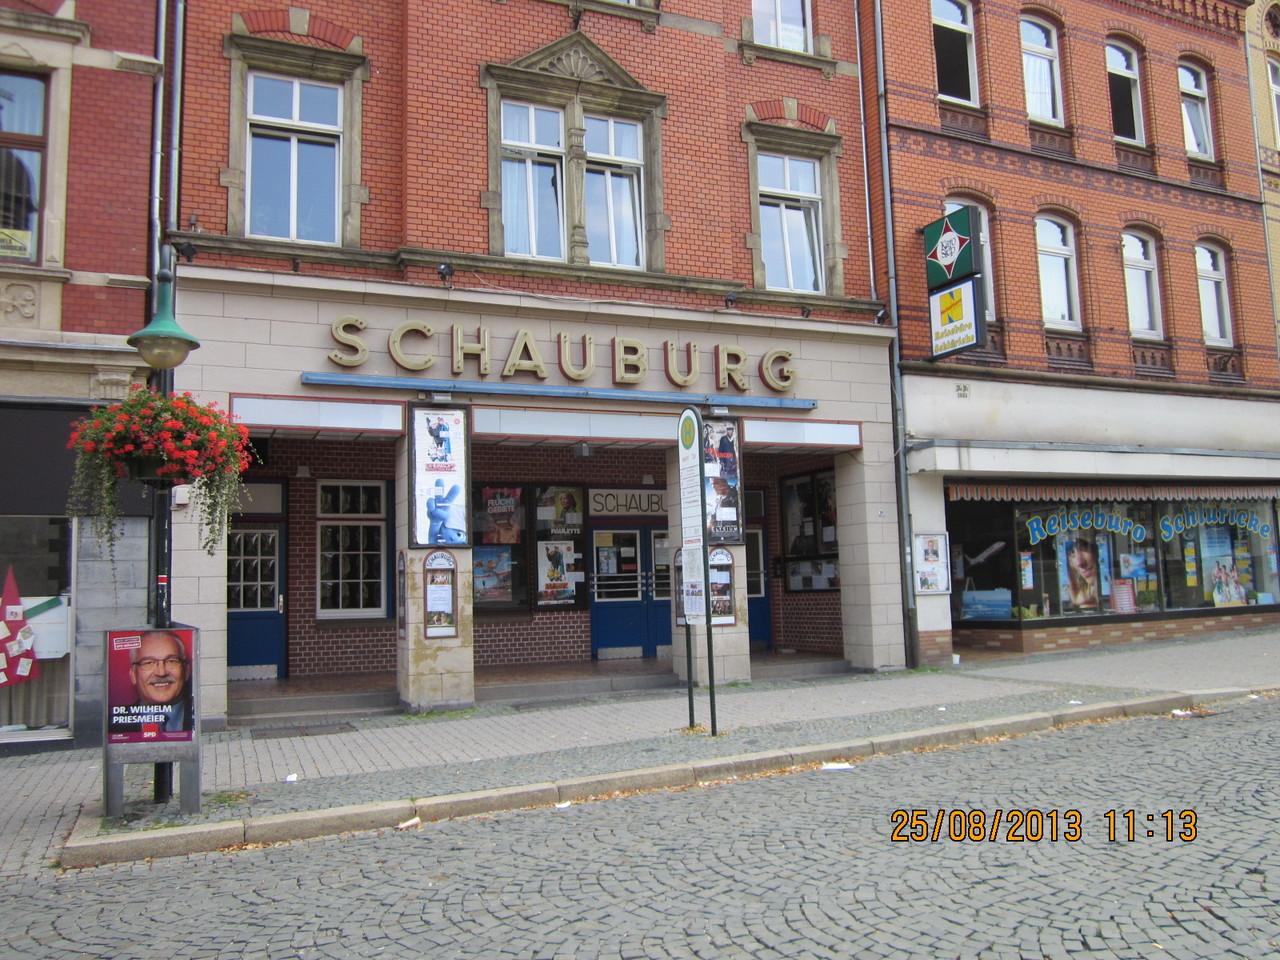 Schauburg - Kino seit 1936